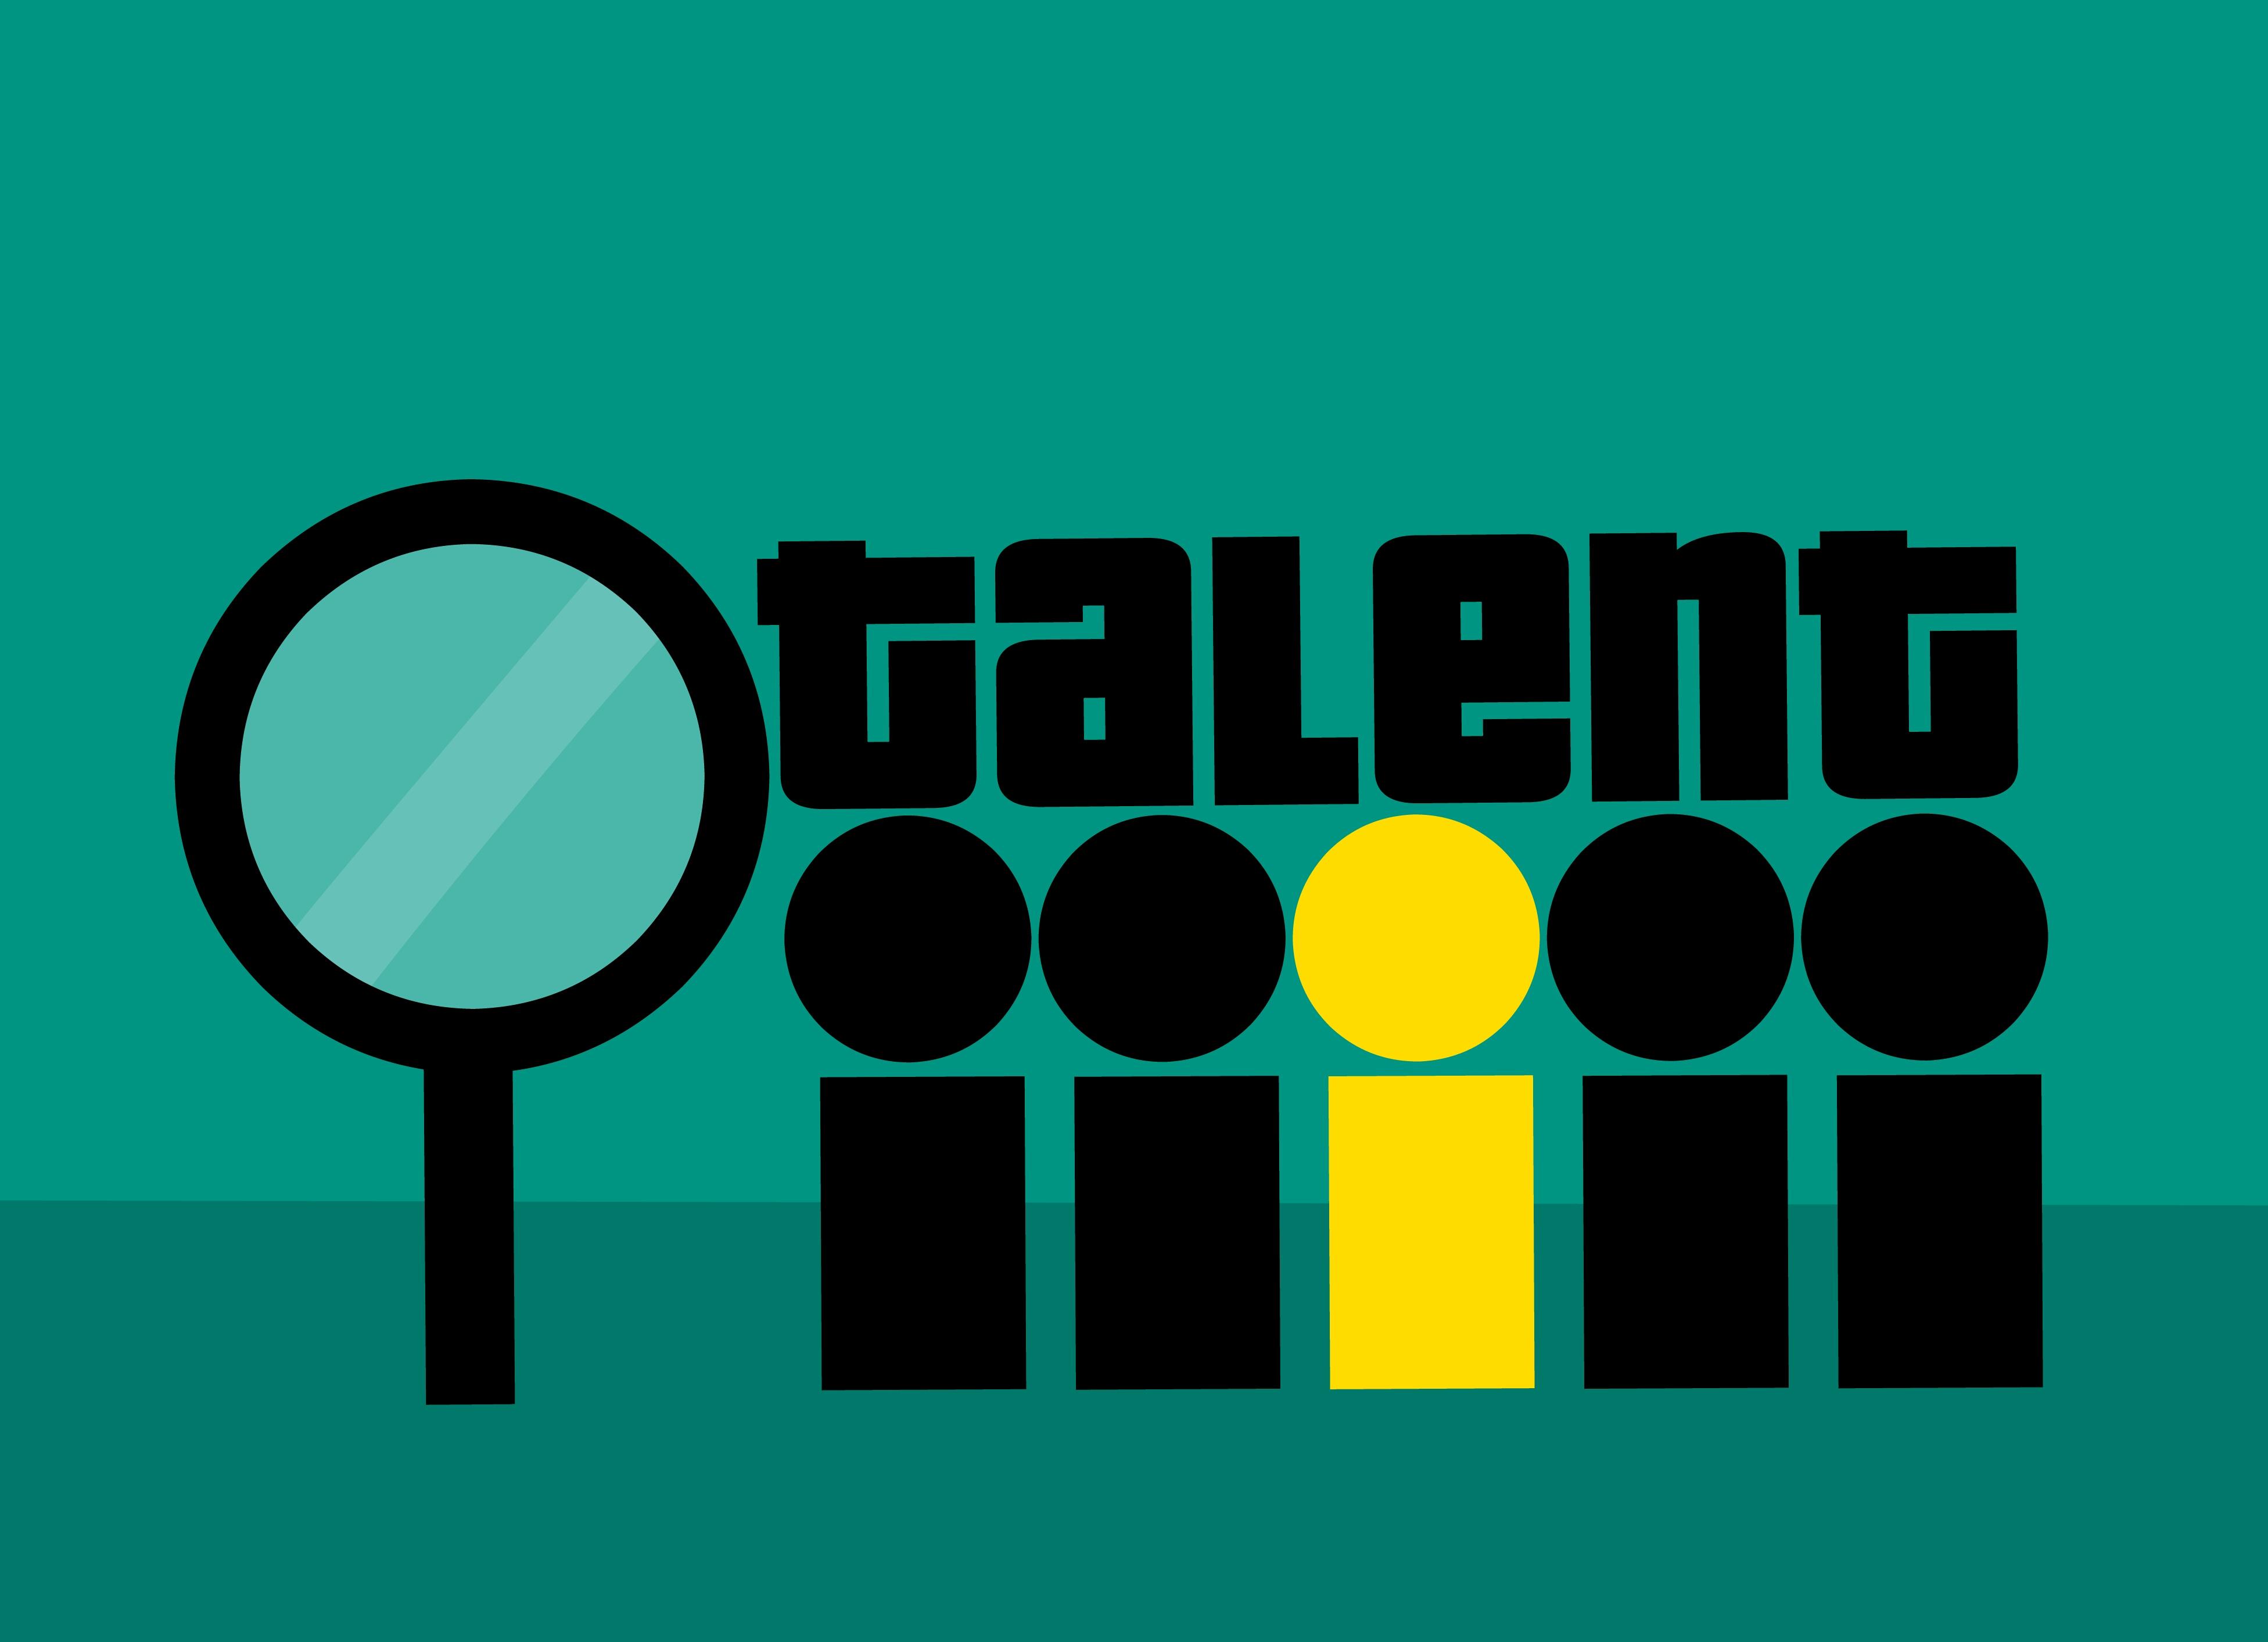 free images got talent skill assessment career